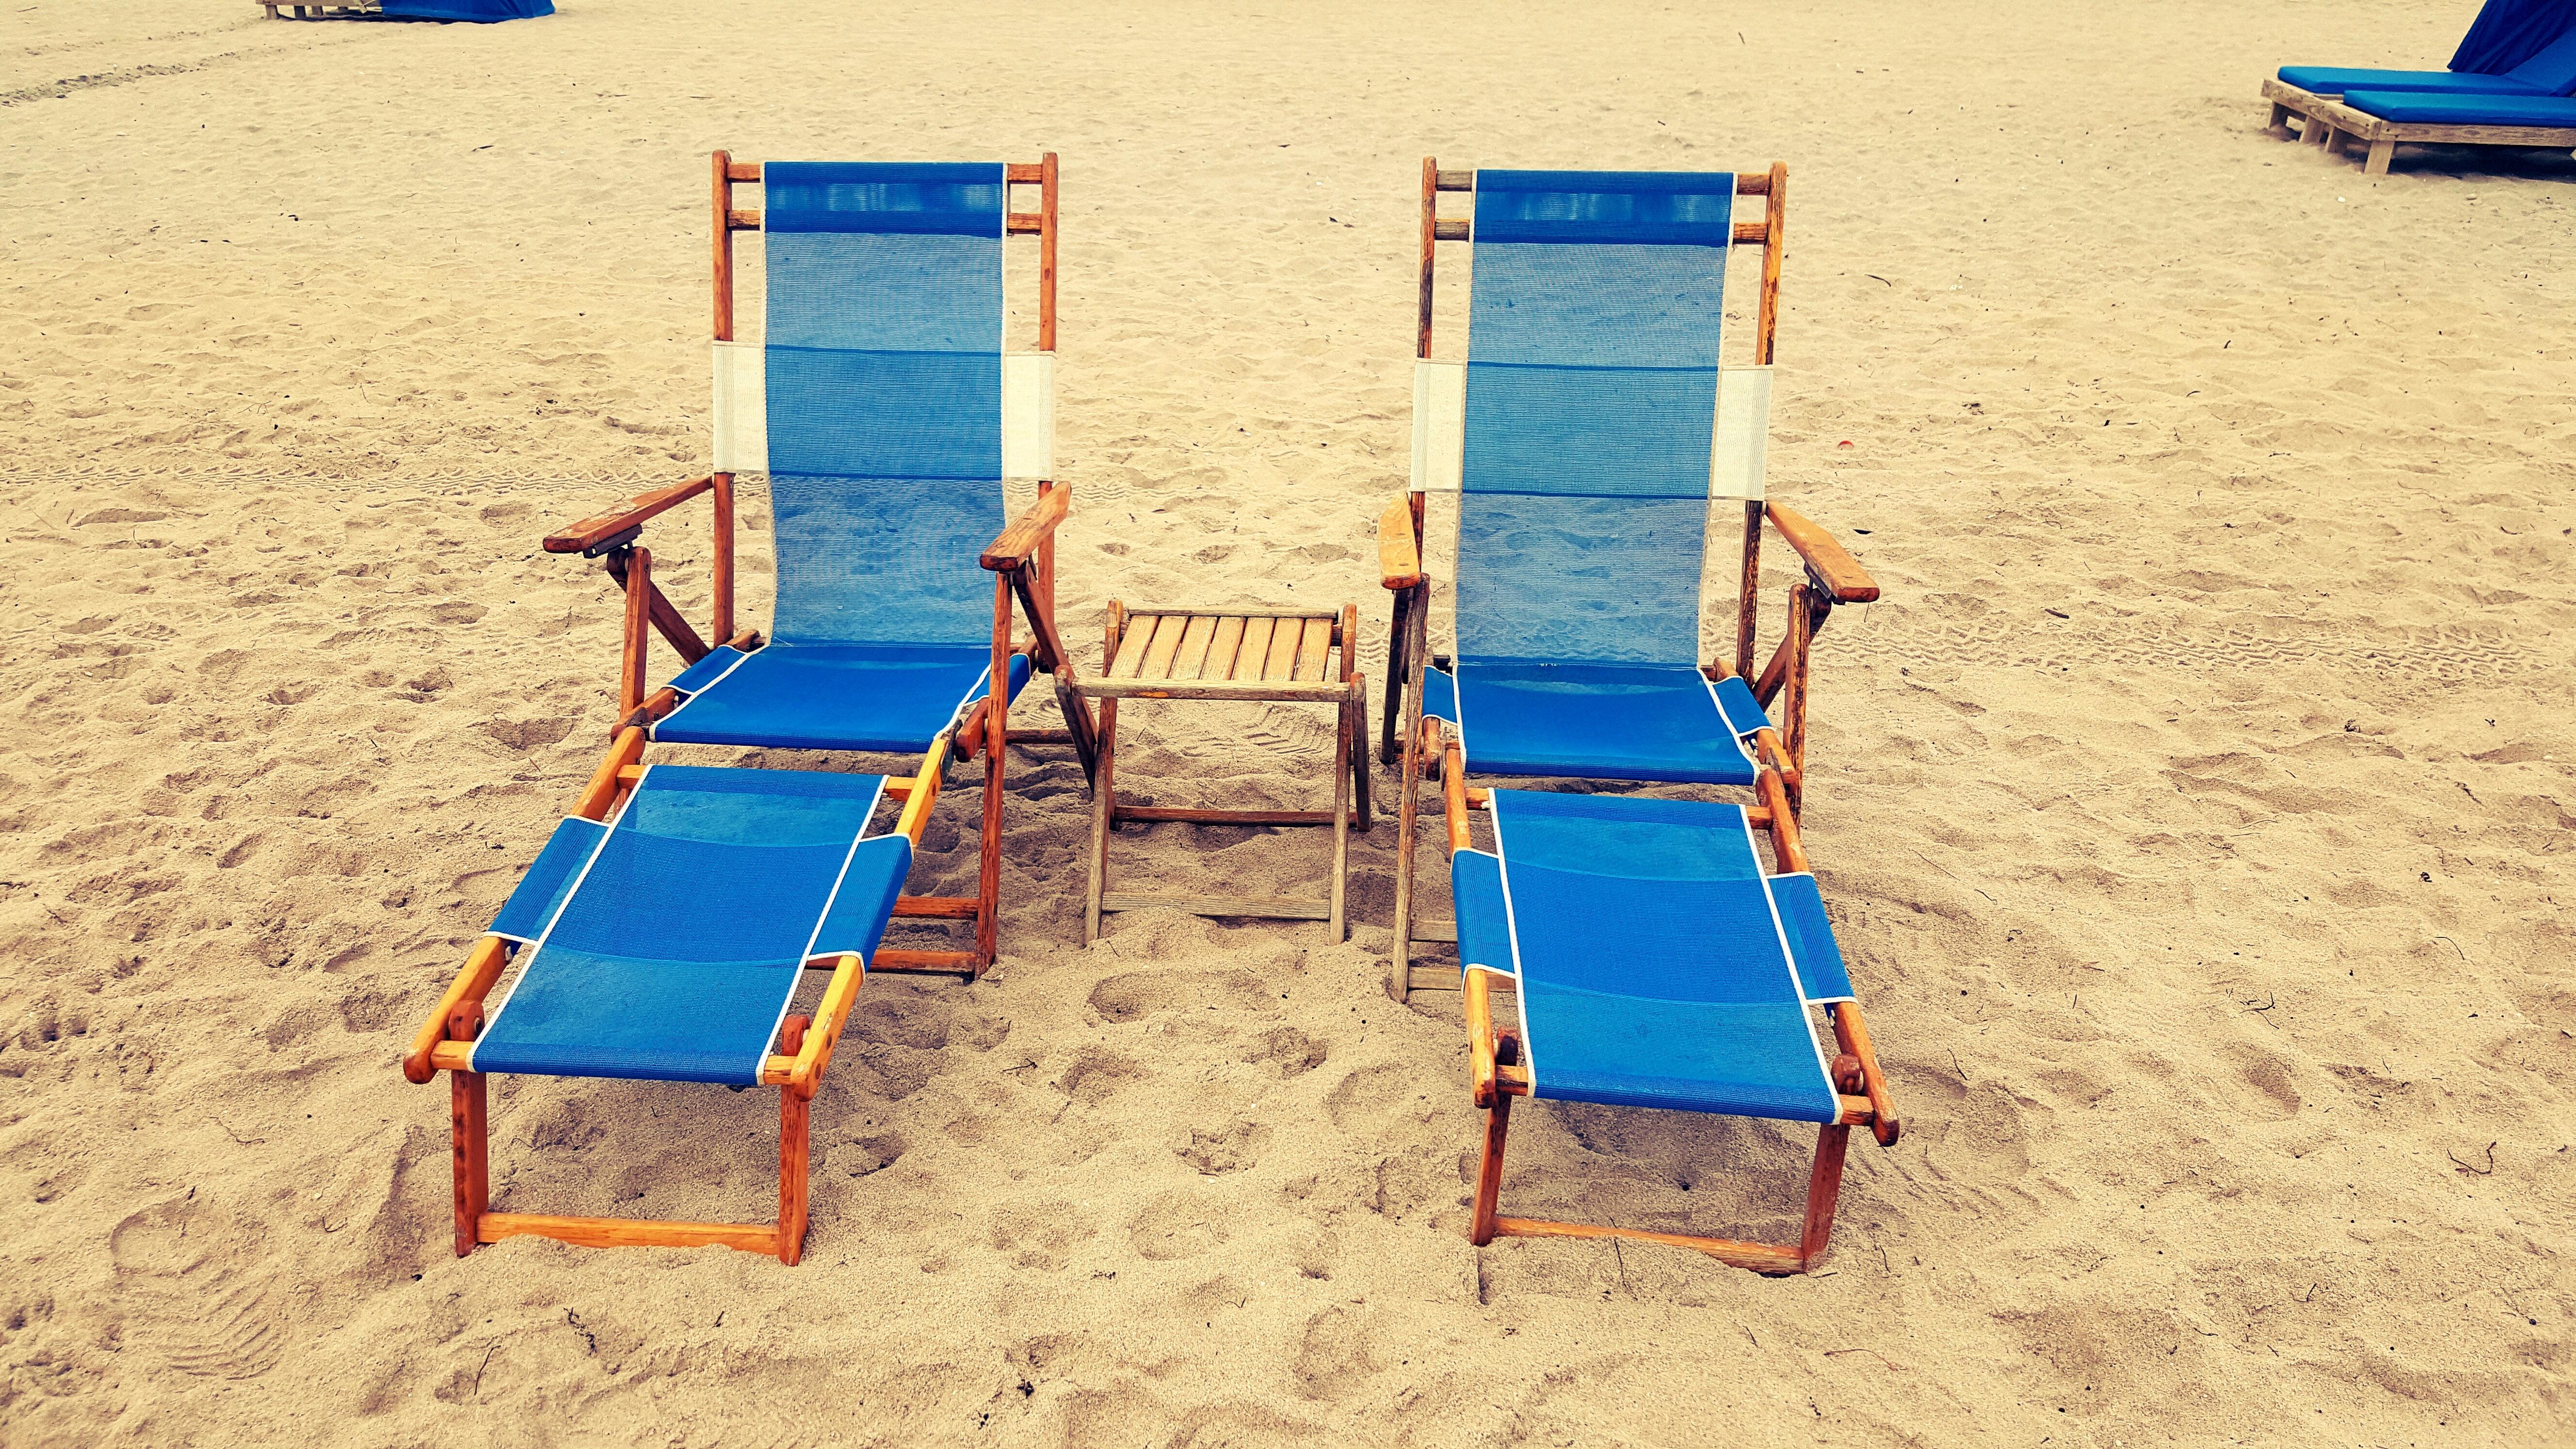 Chair on sand photo